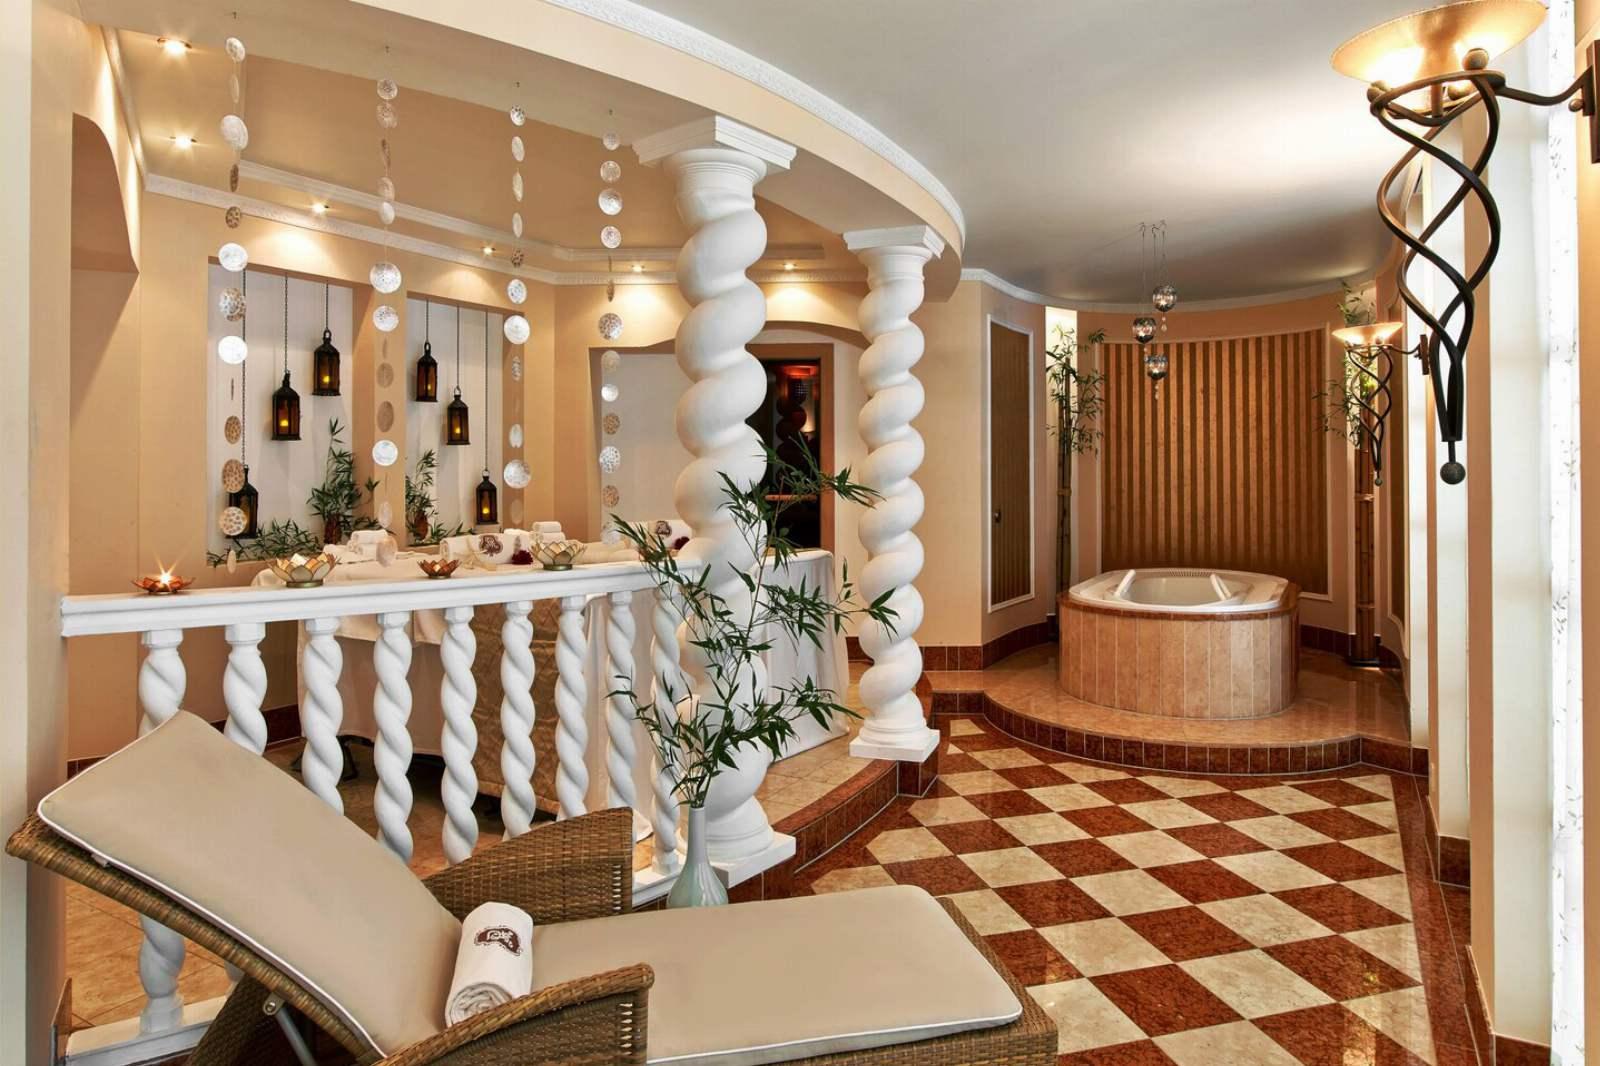 St. Regis Mardavall Resort - Arabella Spa Treatment Room